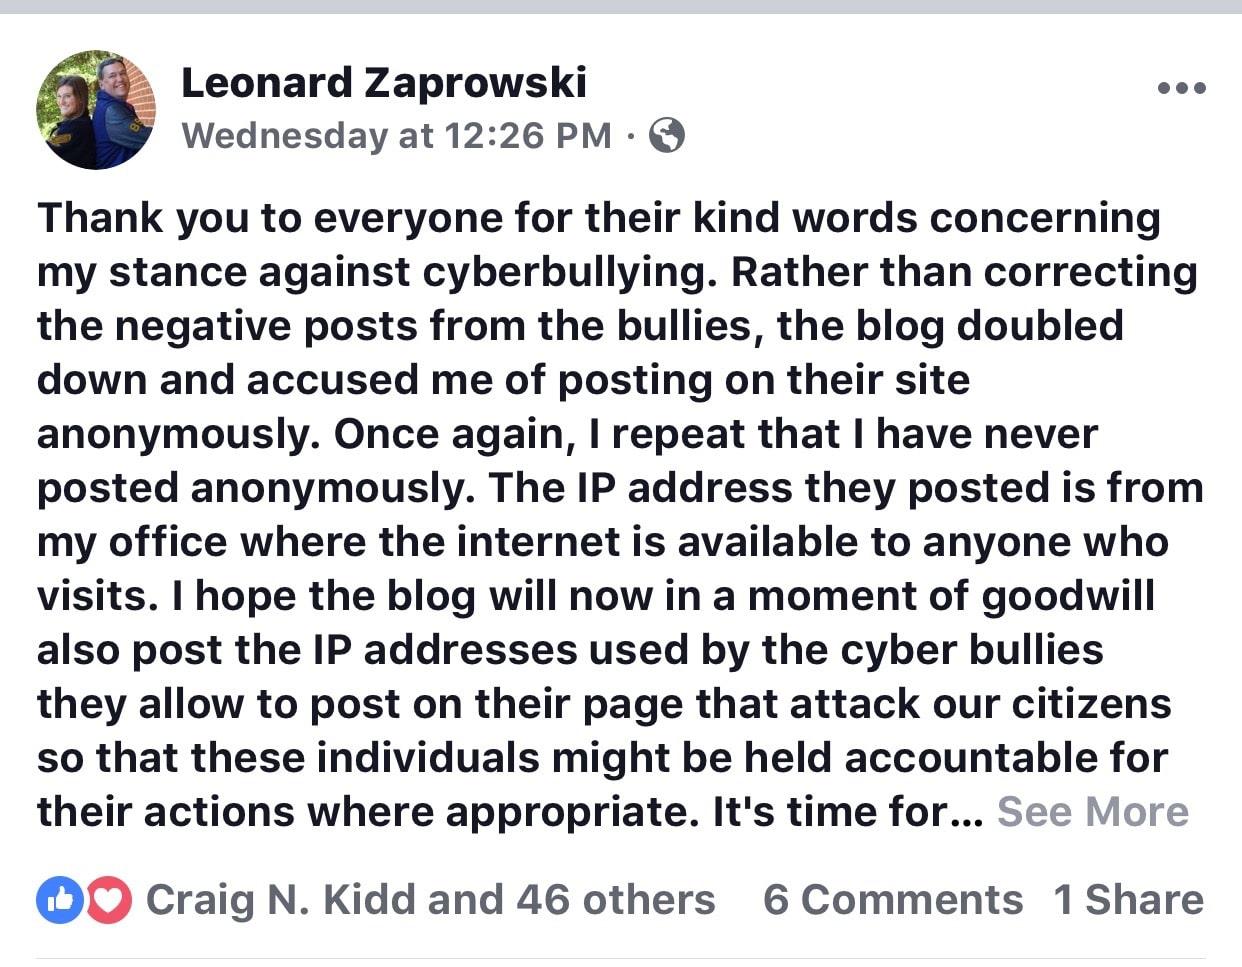 Lenny_zaprowski_FB_post1